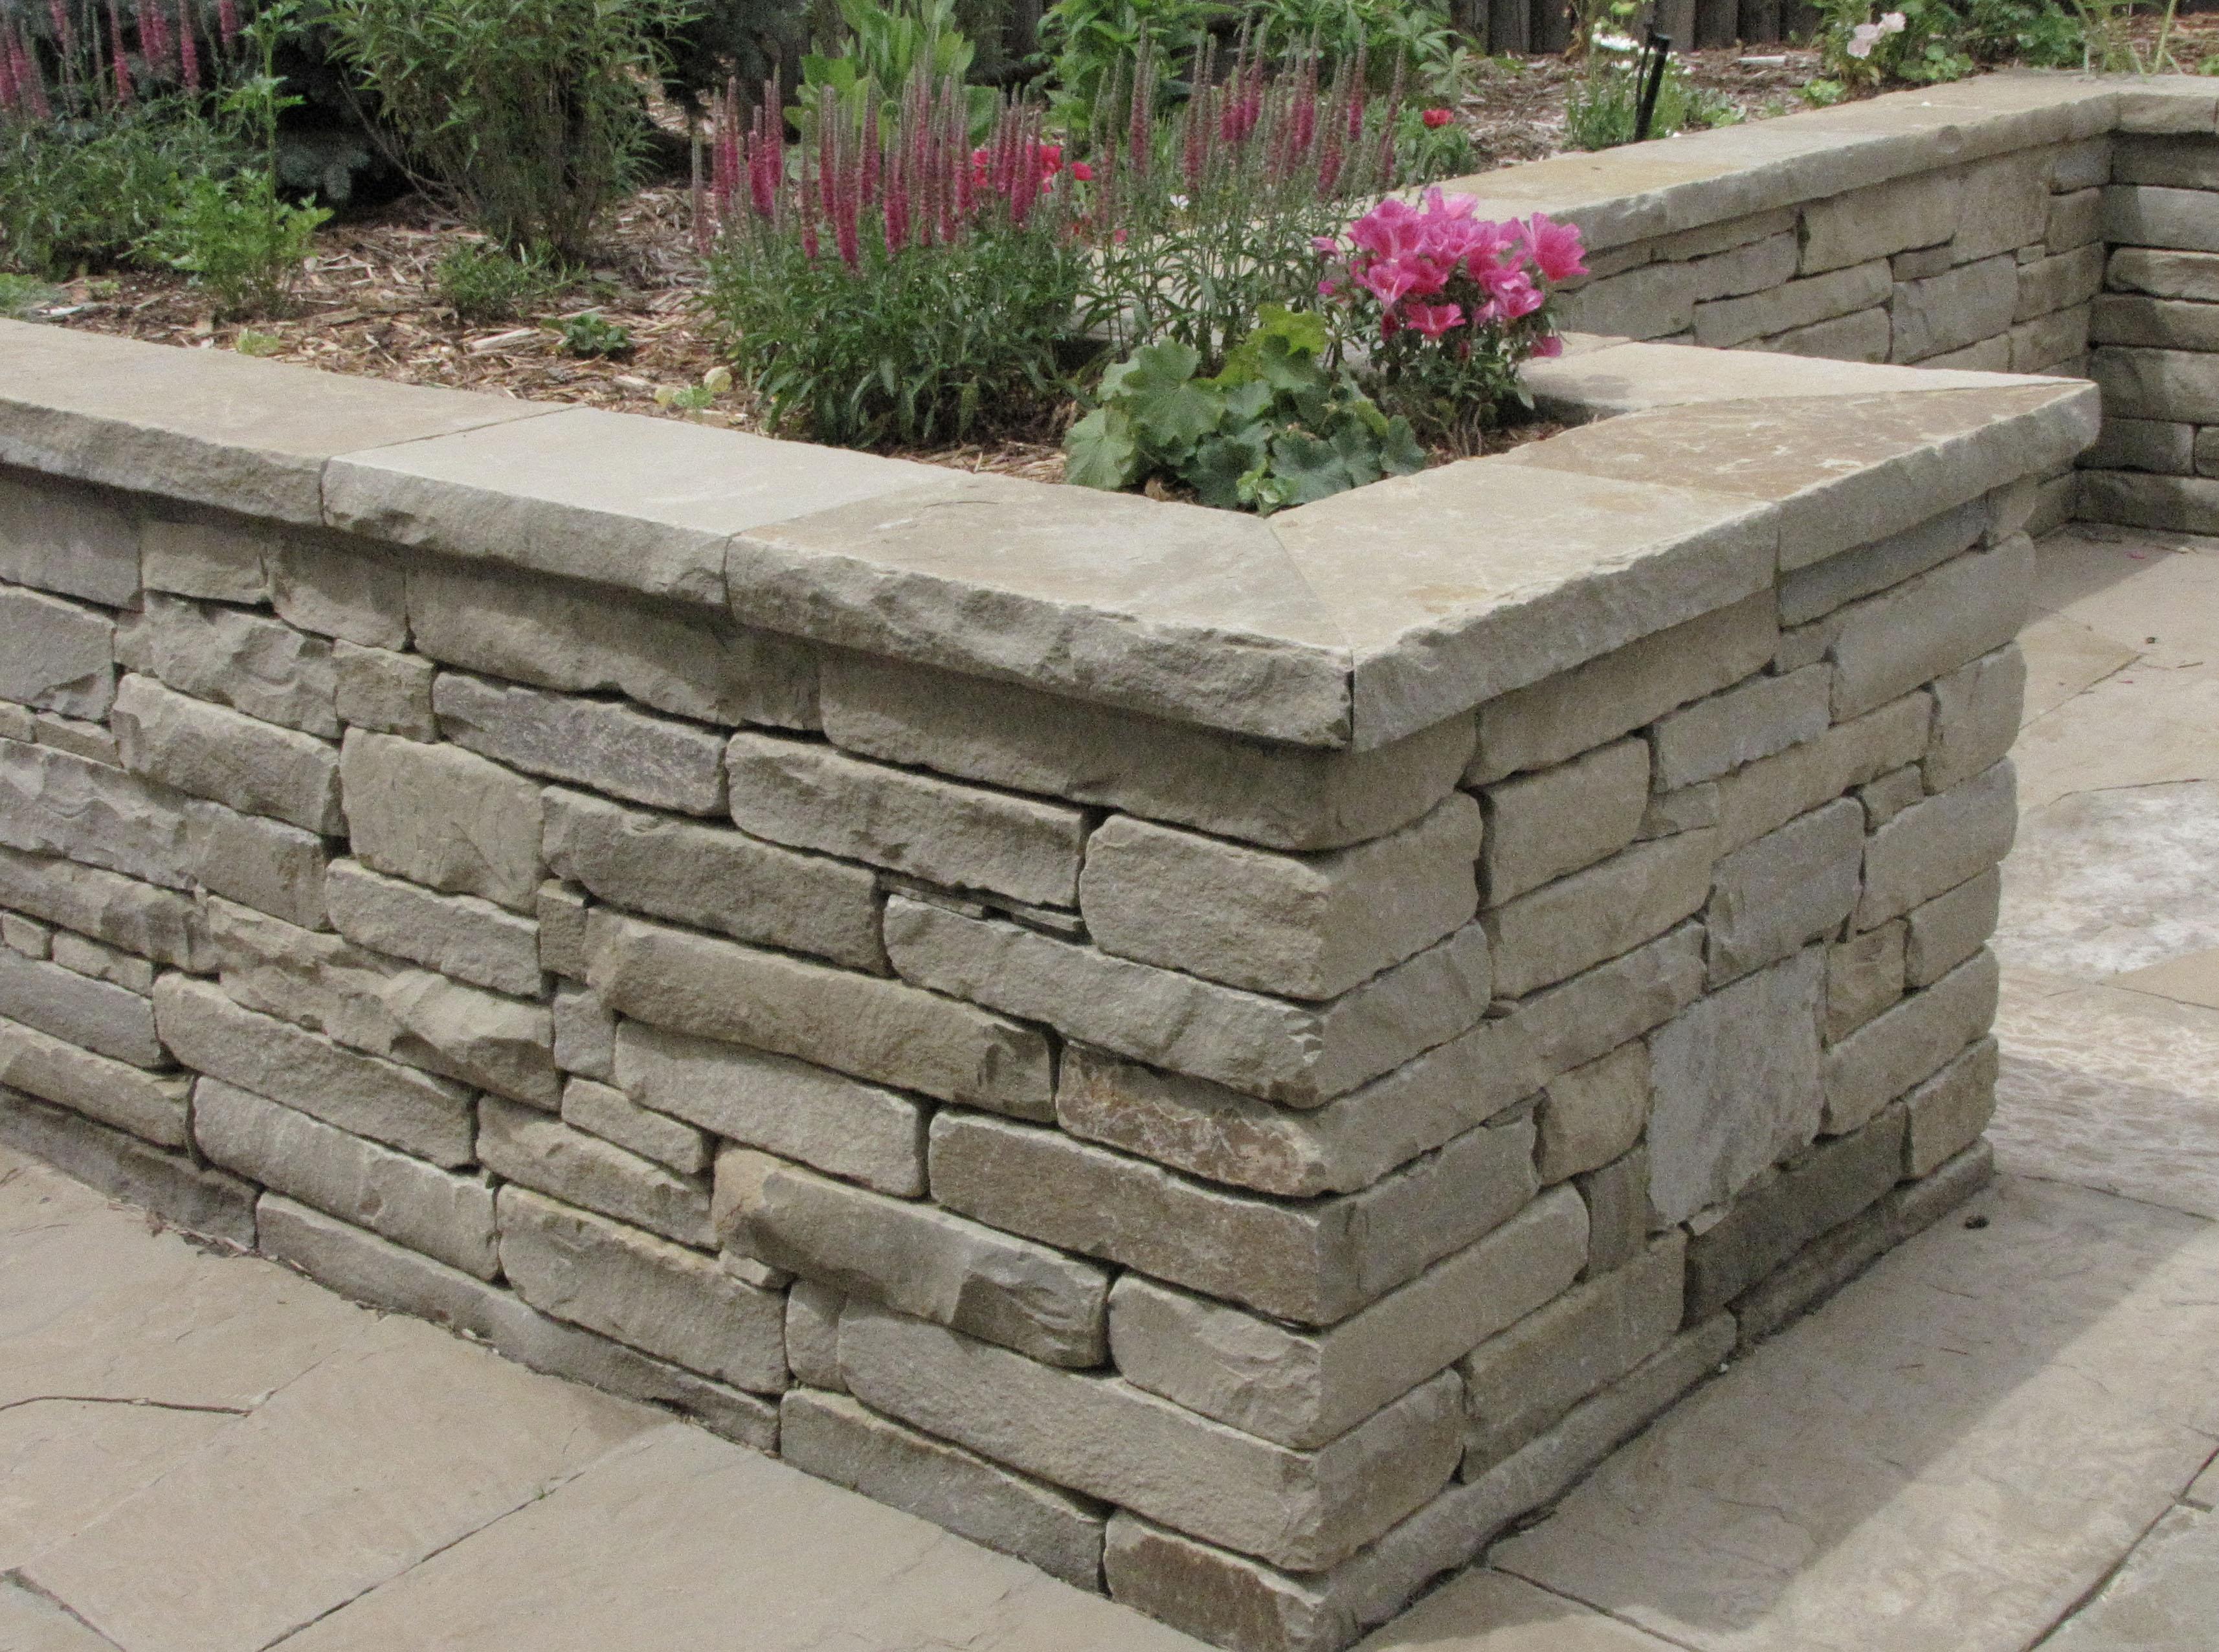 Crisp corners of a stone wall speak of fine craftsmanship.